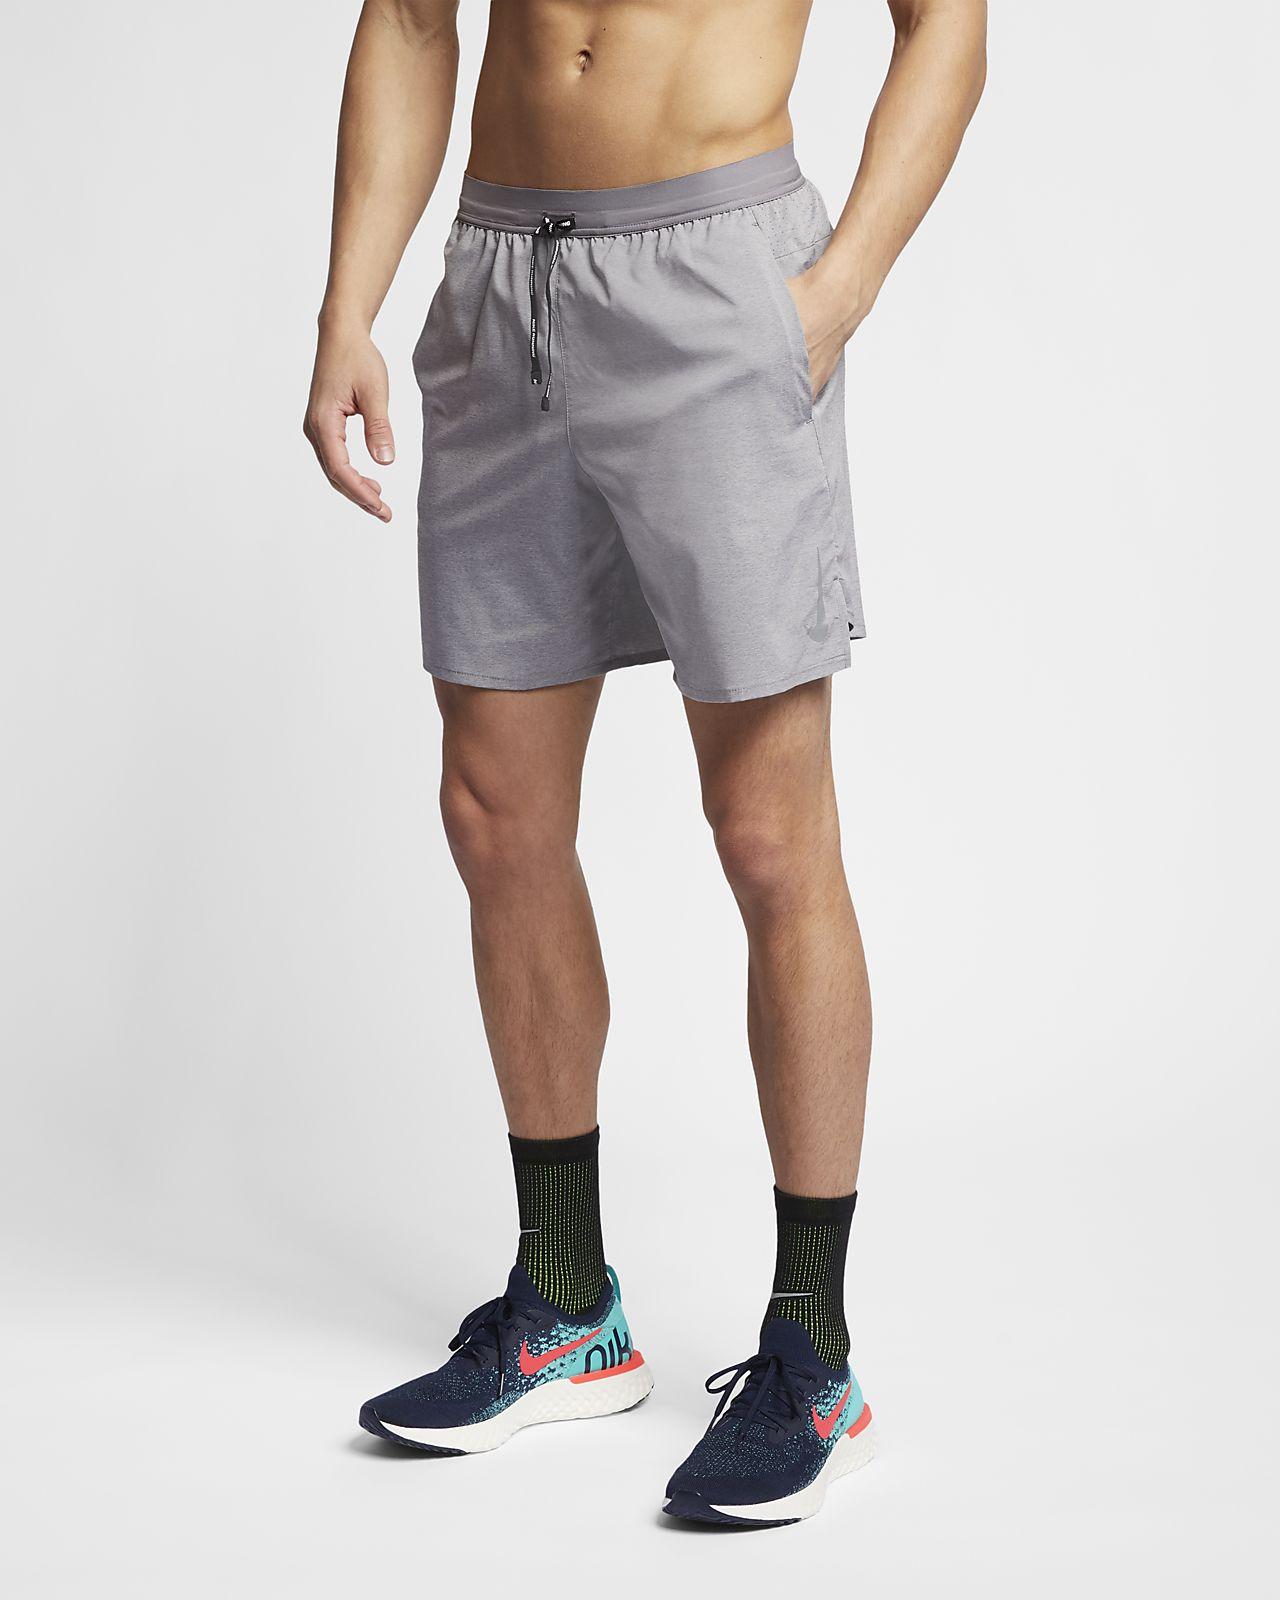 Nike Dri-FIT Flex Stride 2-in-1 hardloopshorts voor heren (18 cm)